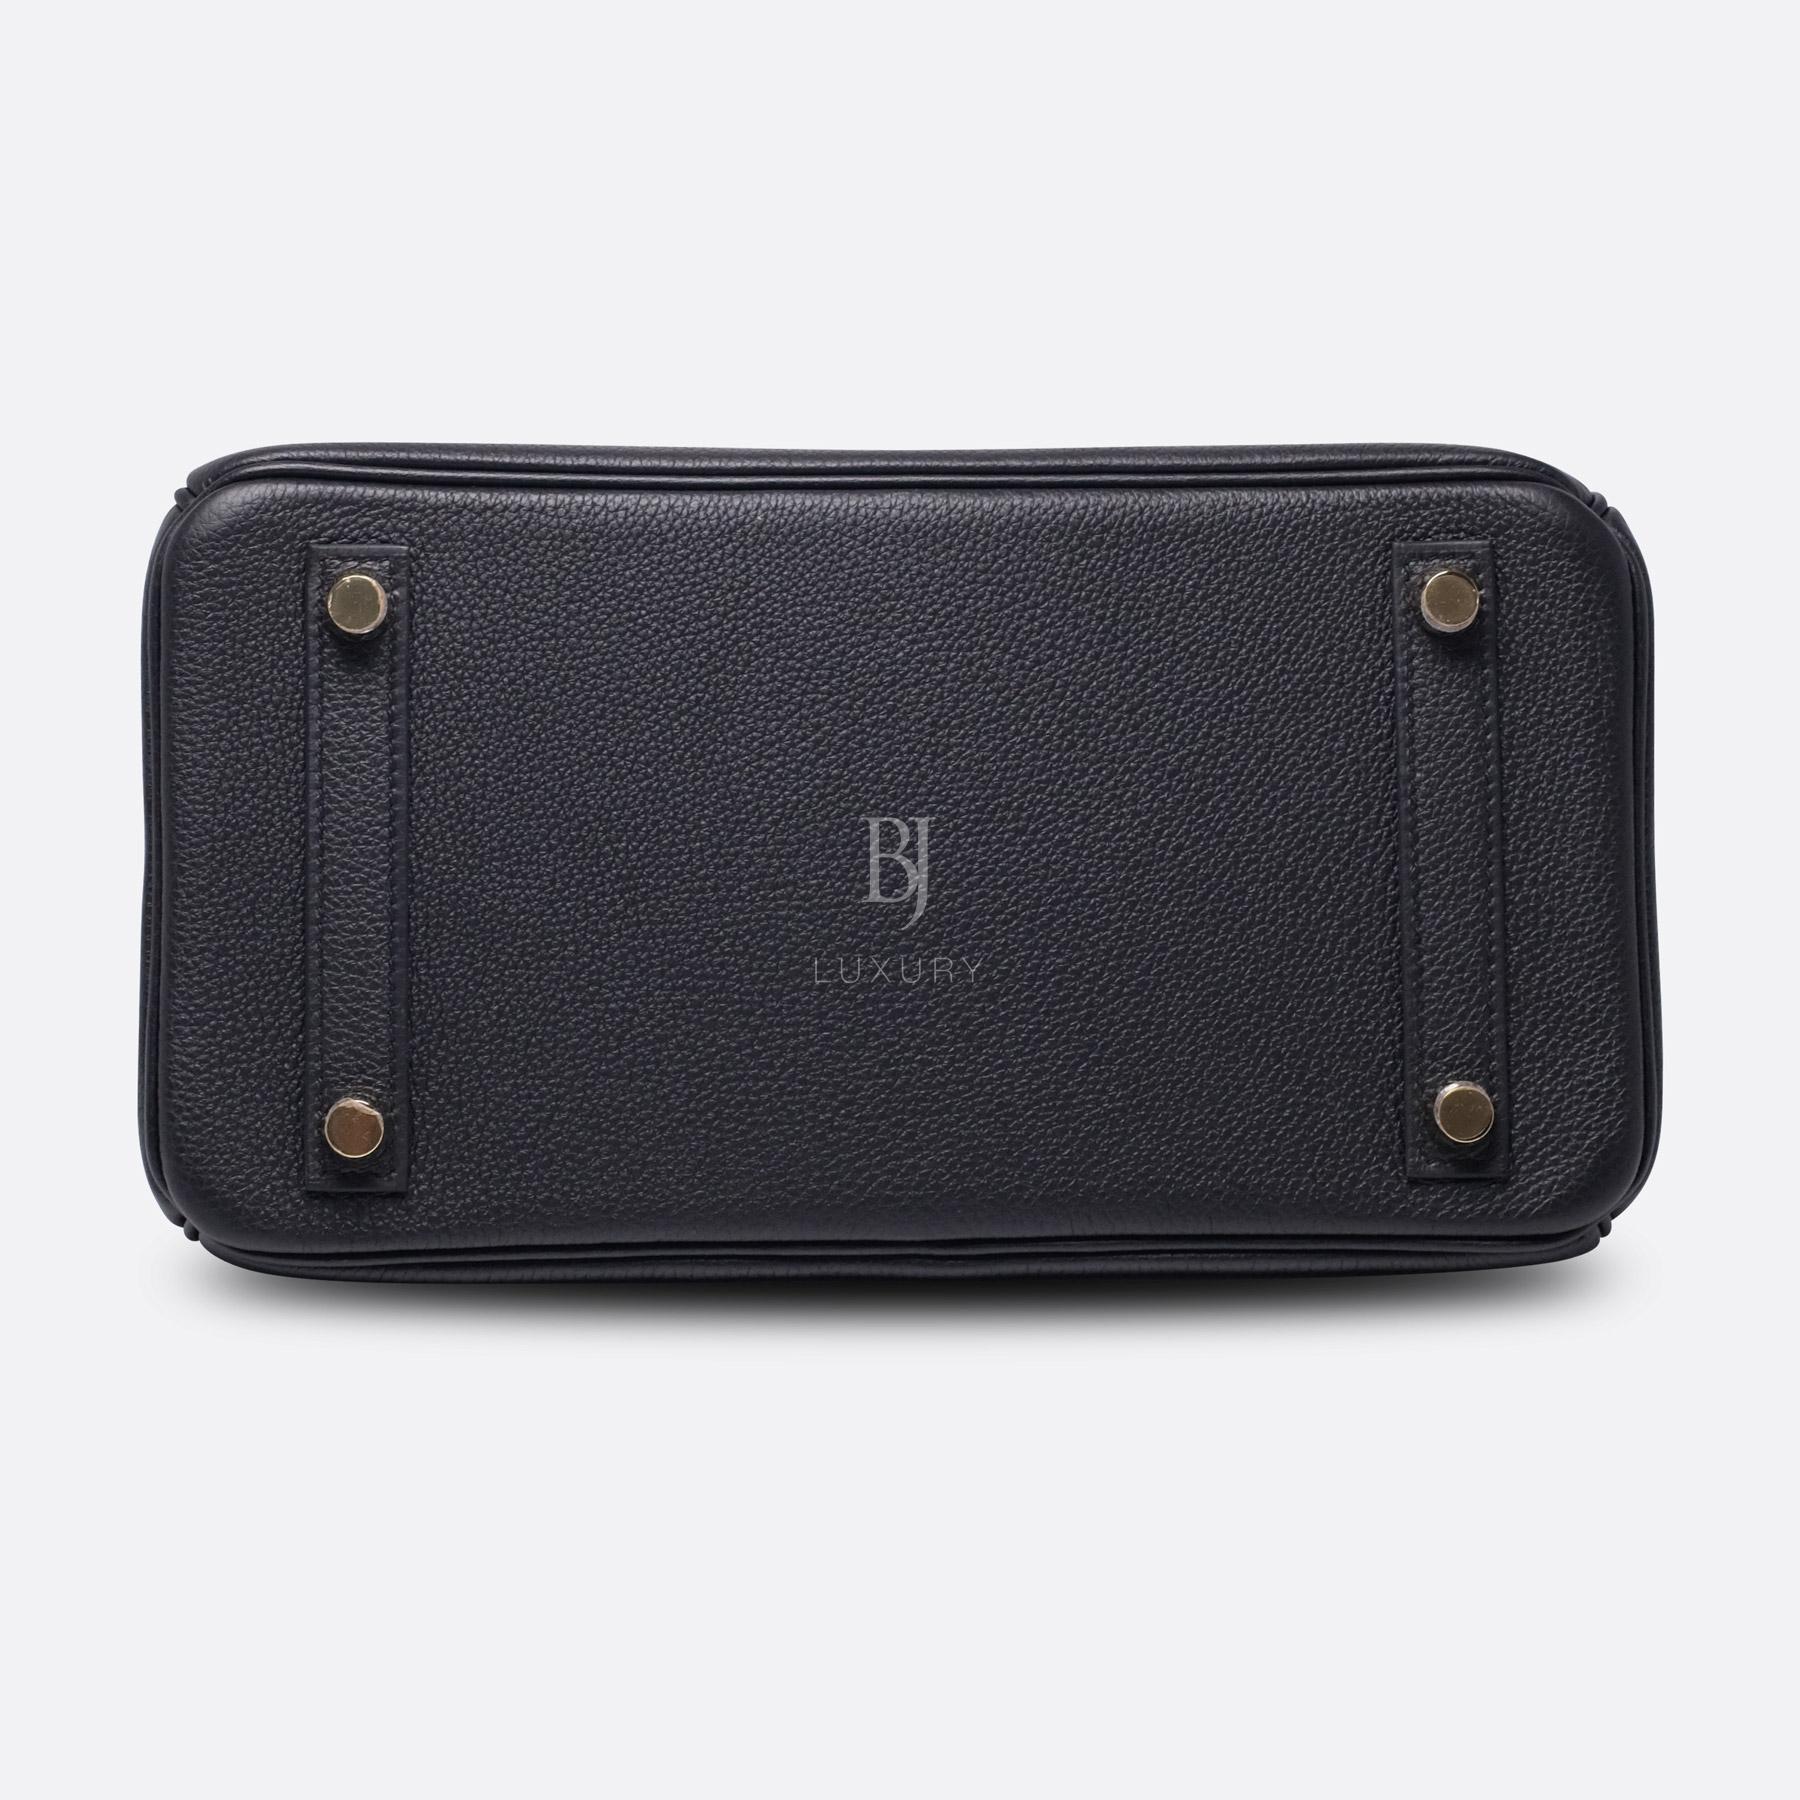 Hermes Birkin 25 Black Togo Gold Hardware BJ Luxury 17.jpg